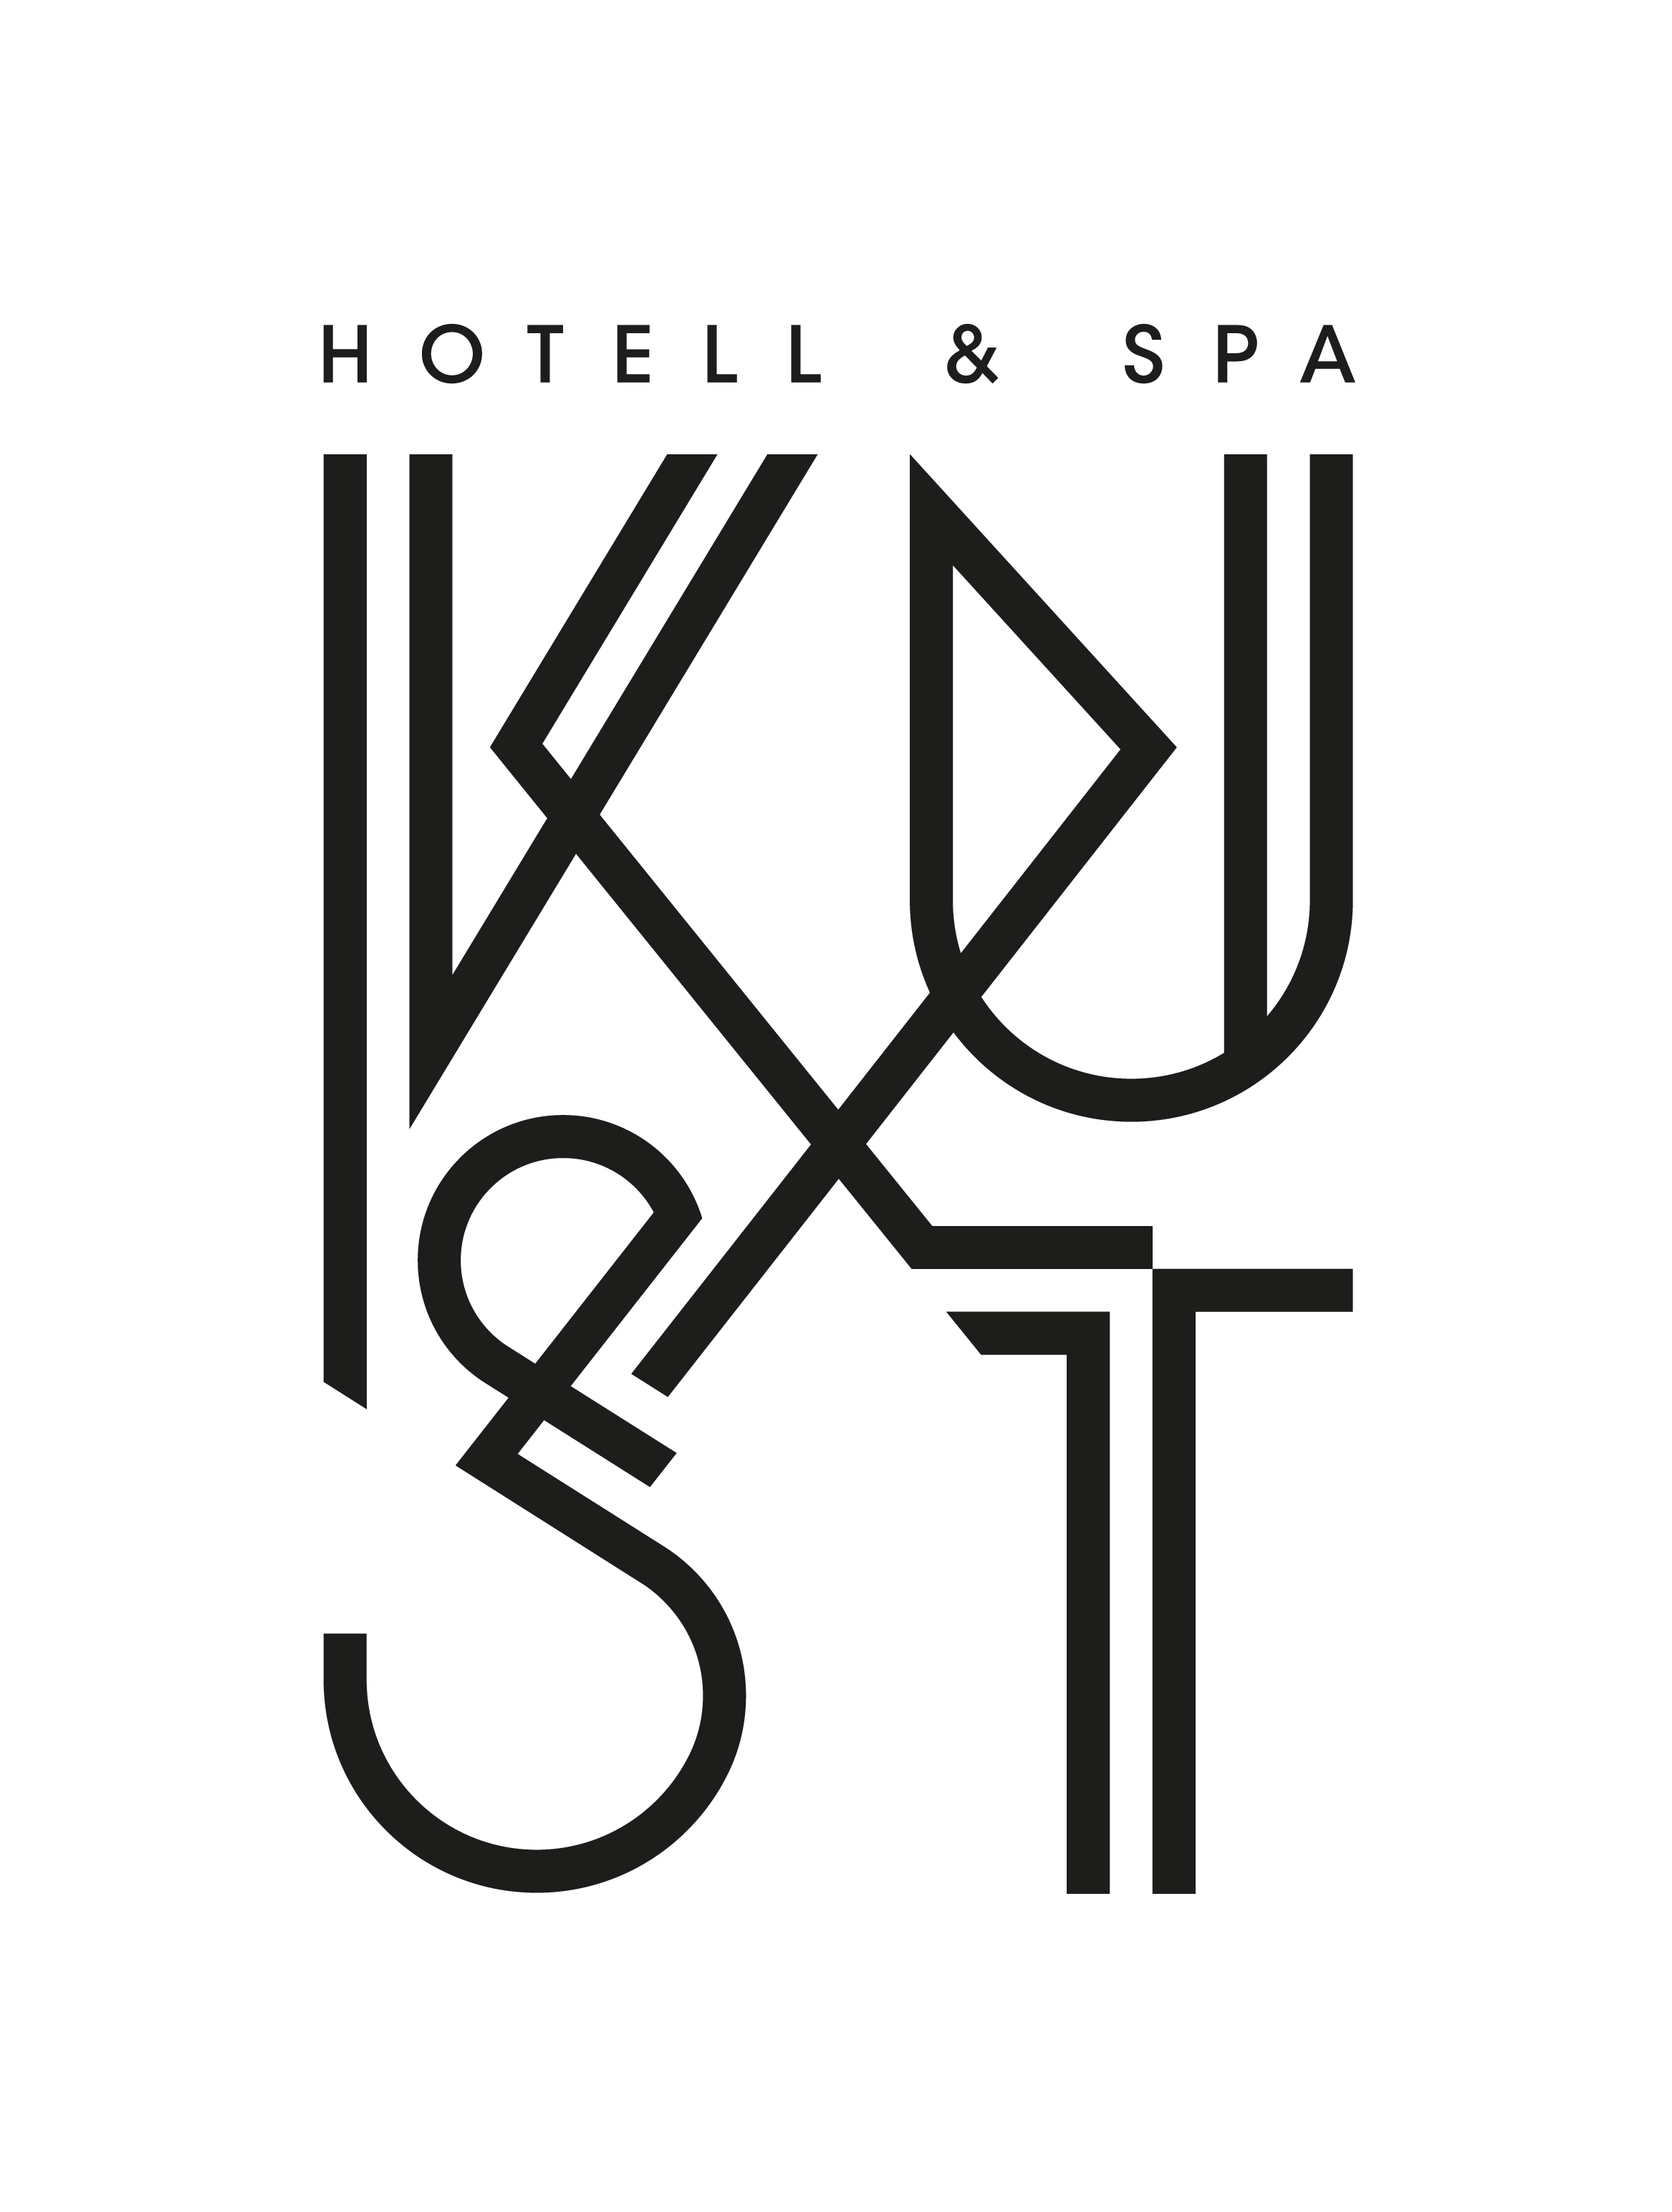 Kust Spa logo